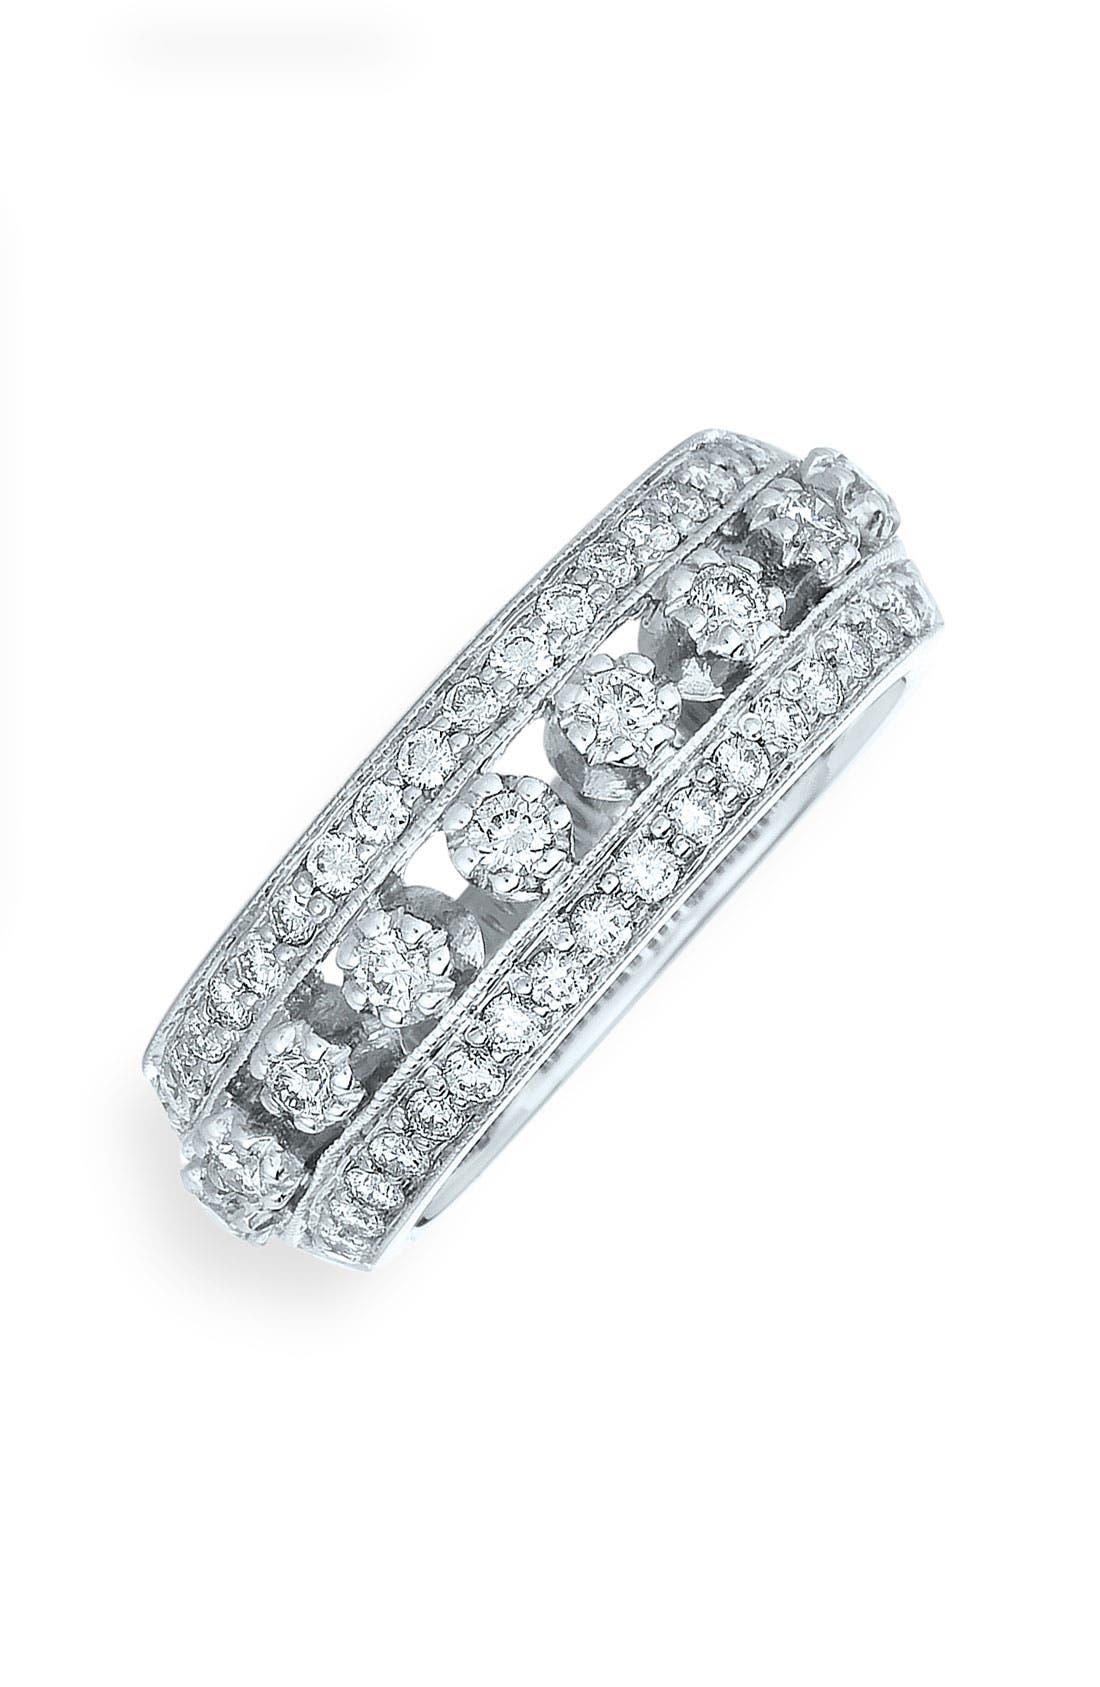 Main Image - Kwiat 'Stardust' 18k White Gold & Diamond Ring